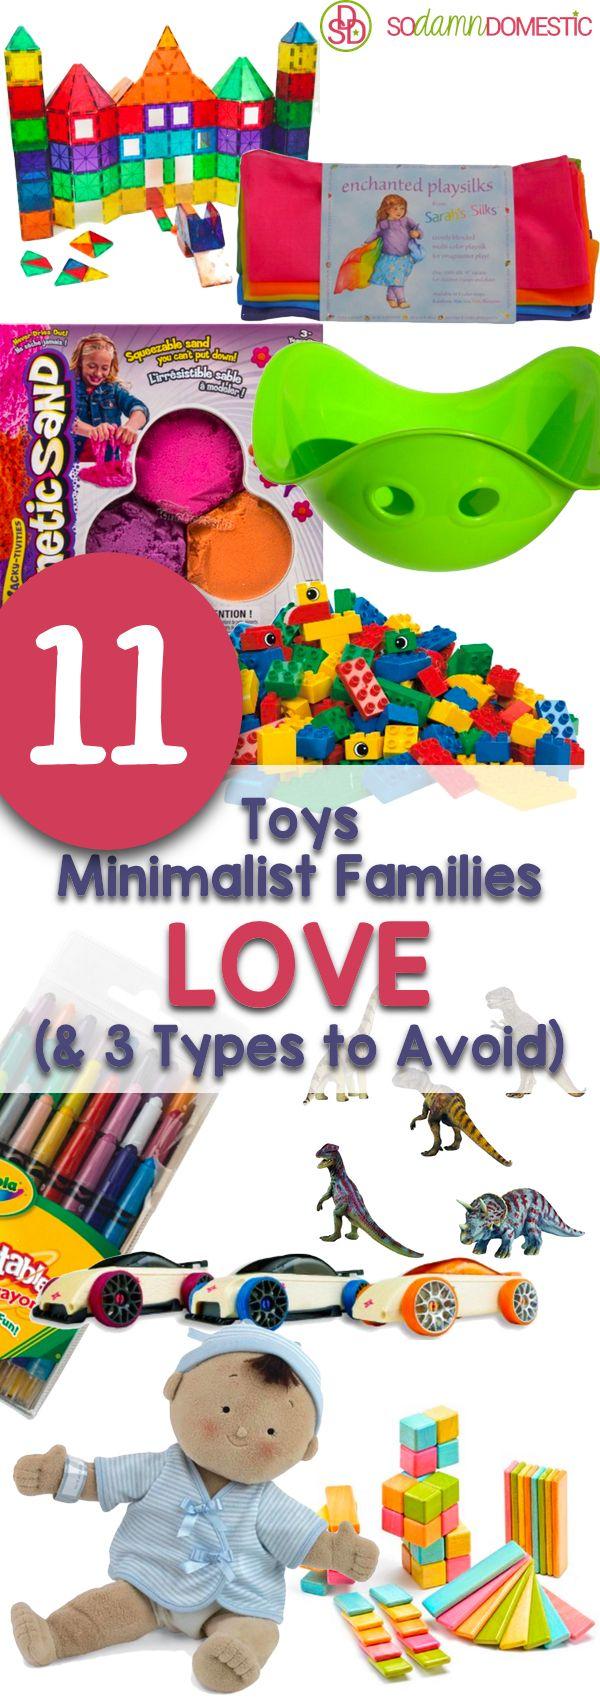 Uncategorized Love Test Kids 11 toys minimalist families love toy and parents love